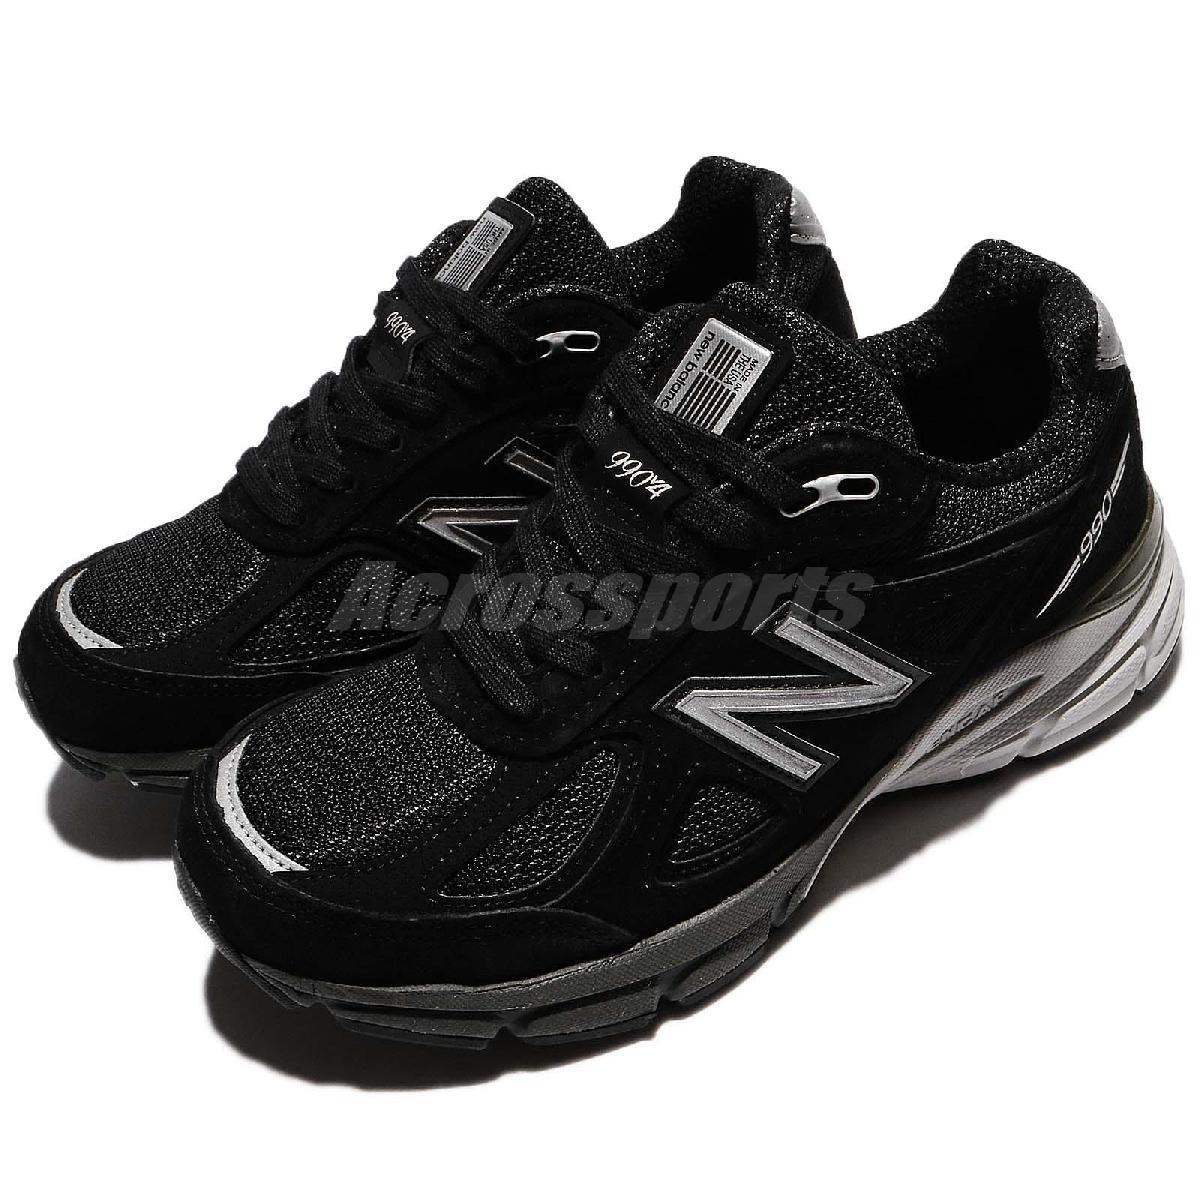 New Balance 慢跑鞋 990 NB 黑 灰 麂皮 寬楦 美國製 運動鞋 女鞋【PUMP306】 W990BK4D